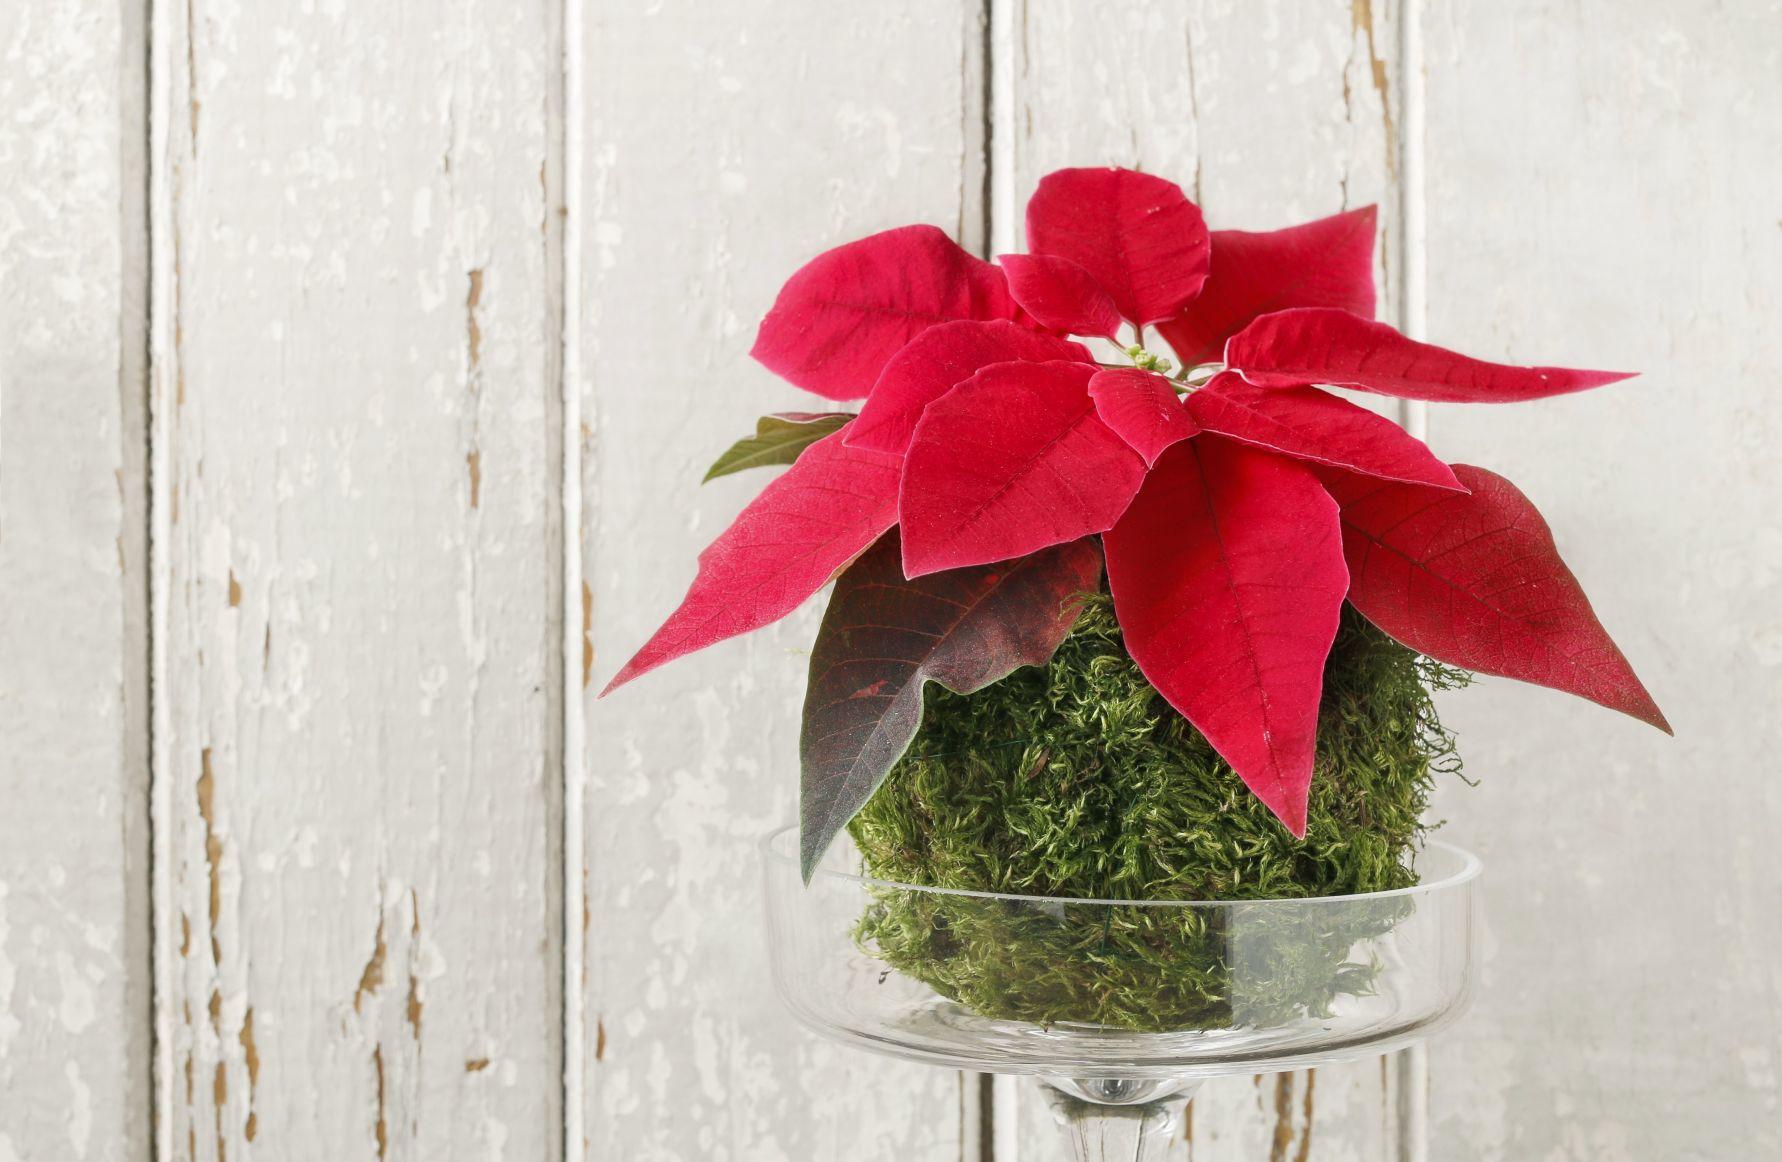 Waterloo-Cedar Falls Courier & Poinsettia stems make pretty seasonal cut flowers ...